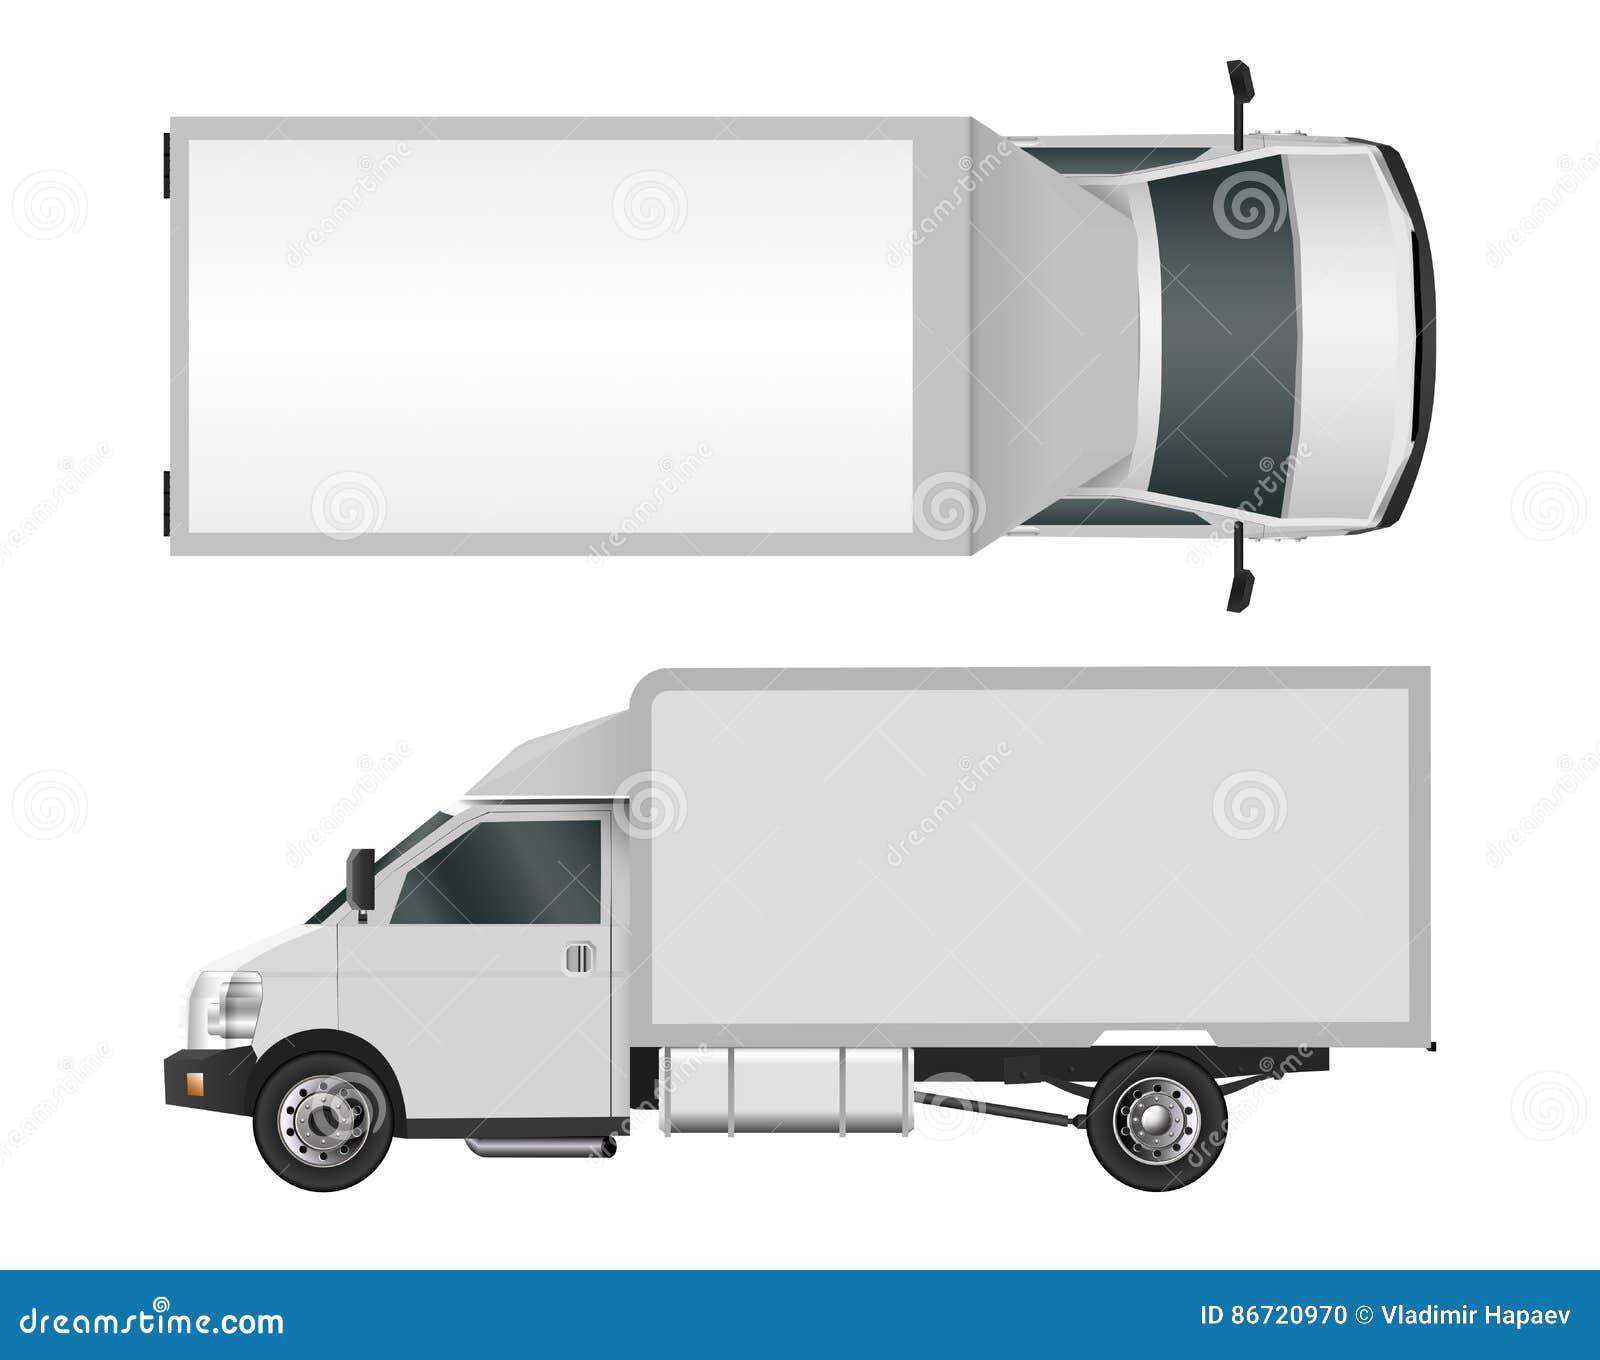 isuzu box truck template 15416 notefolio. Black Bedroom Furniture Sets. Home Design Ideas